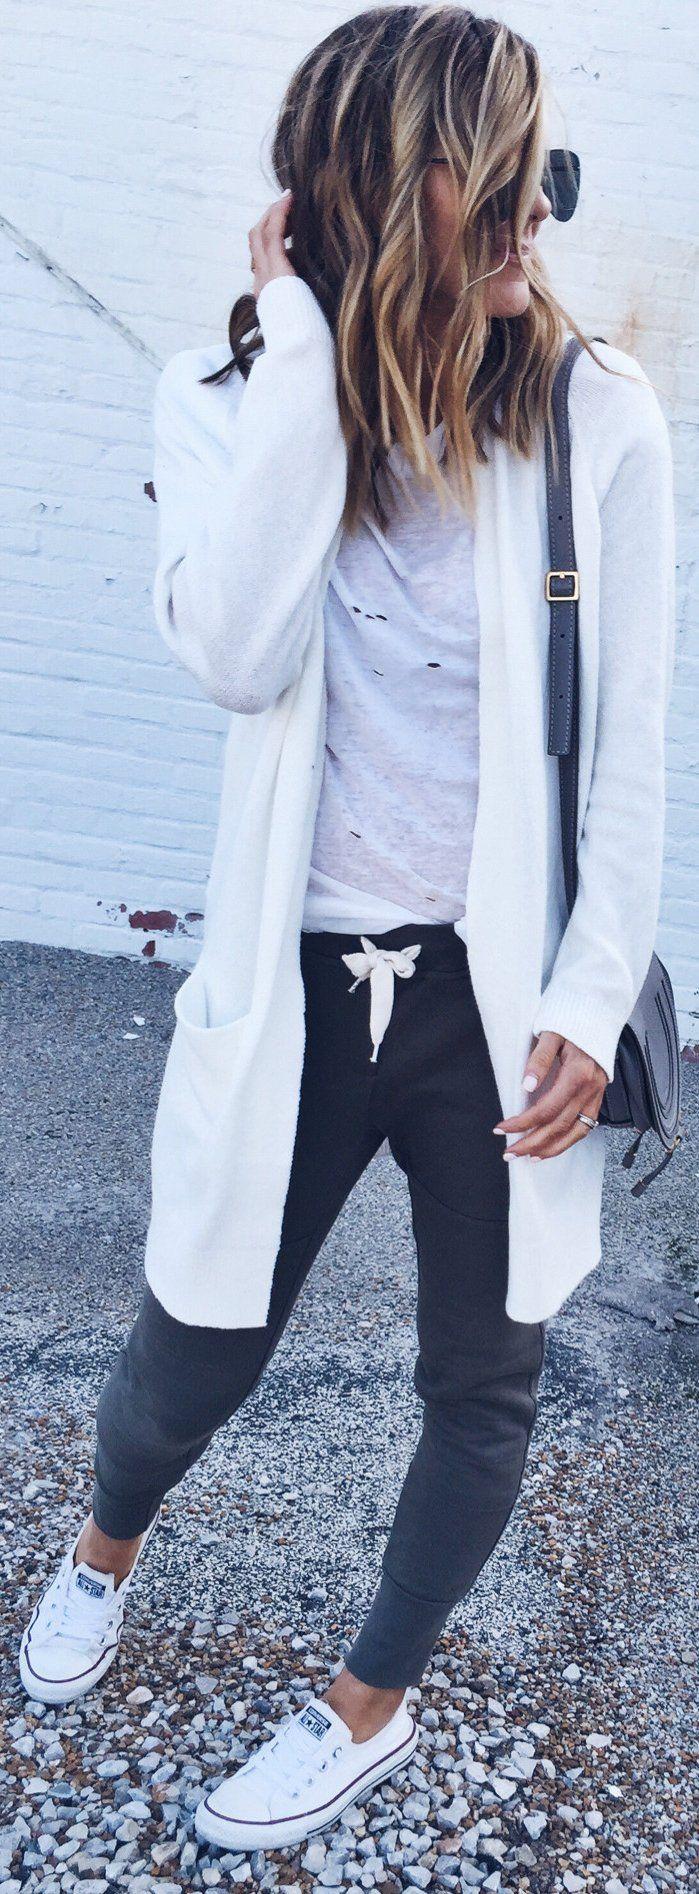 White Cardigan / White Ripped Top / Dark Pants / White Sneakers